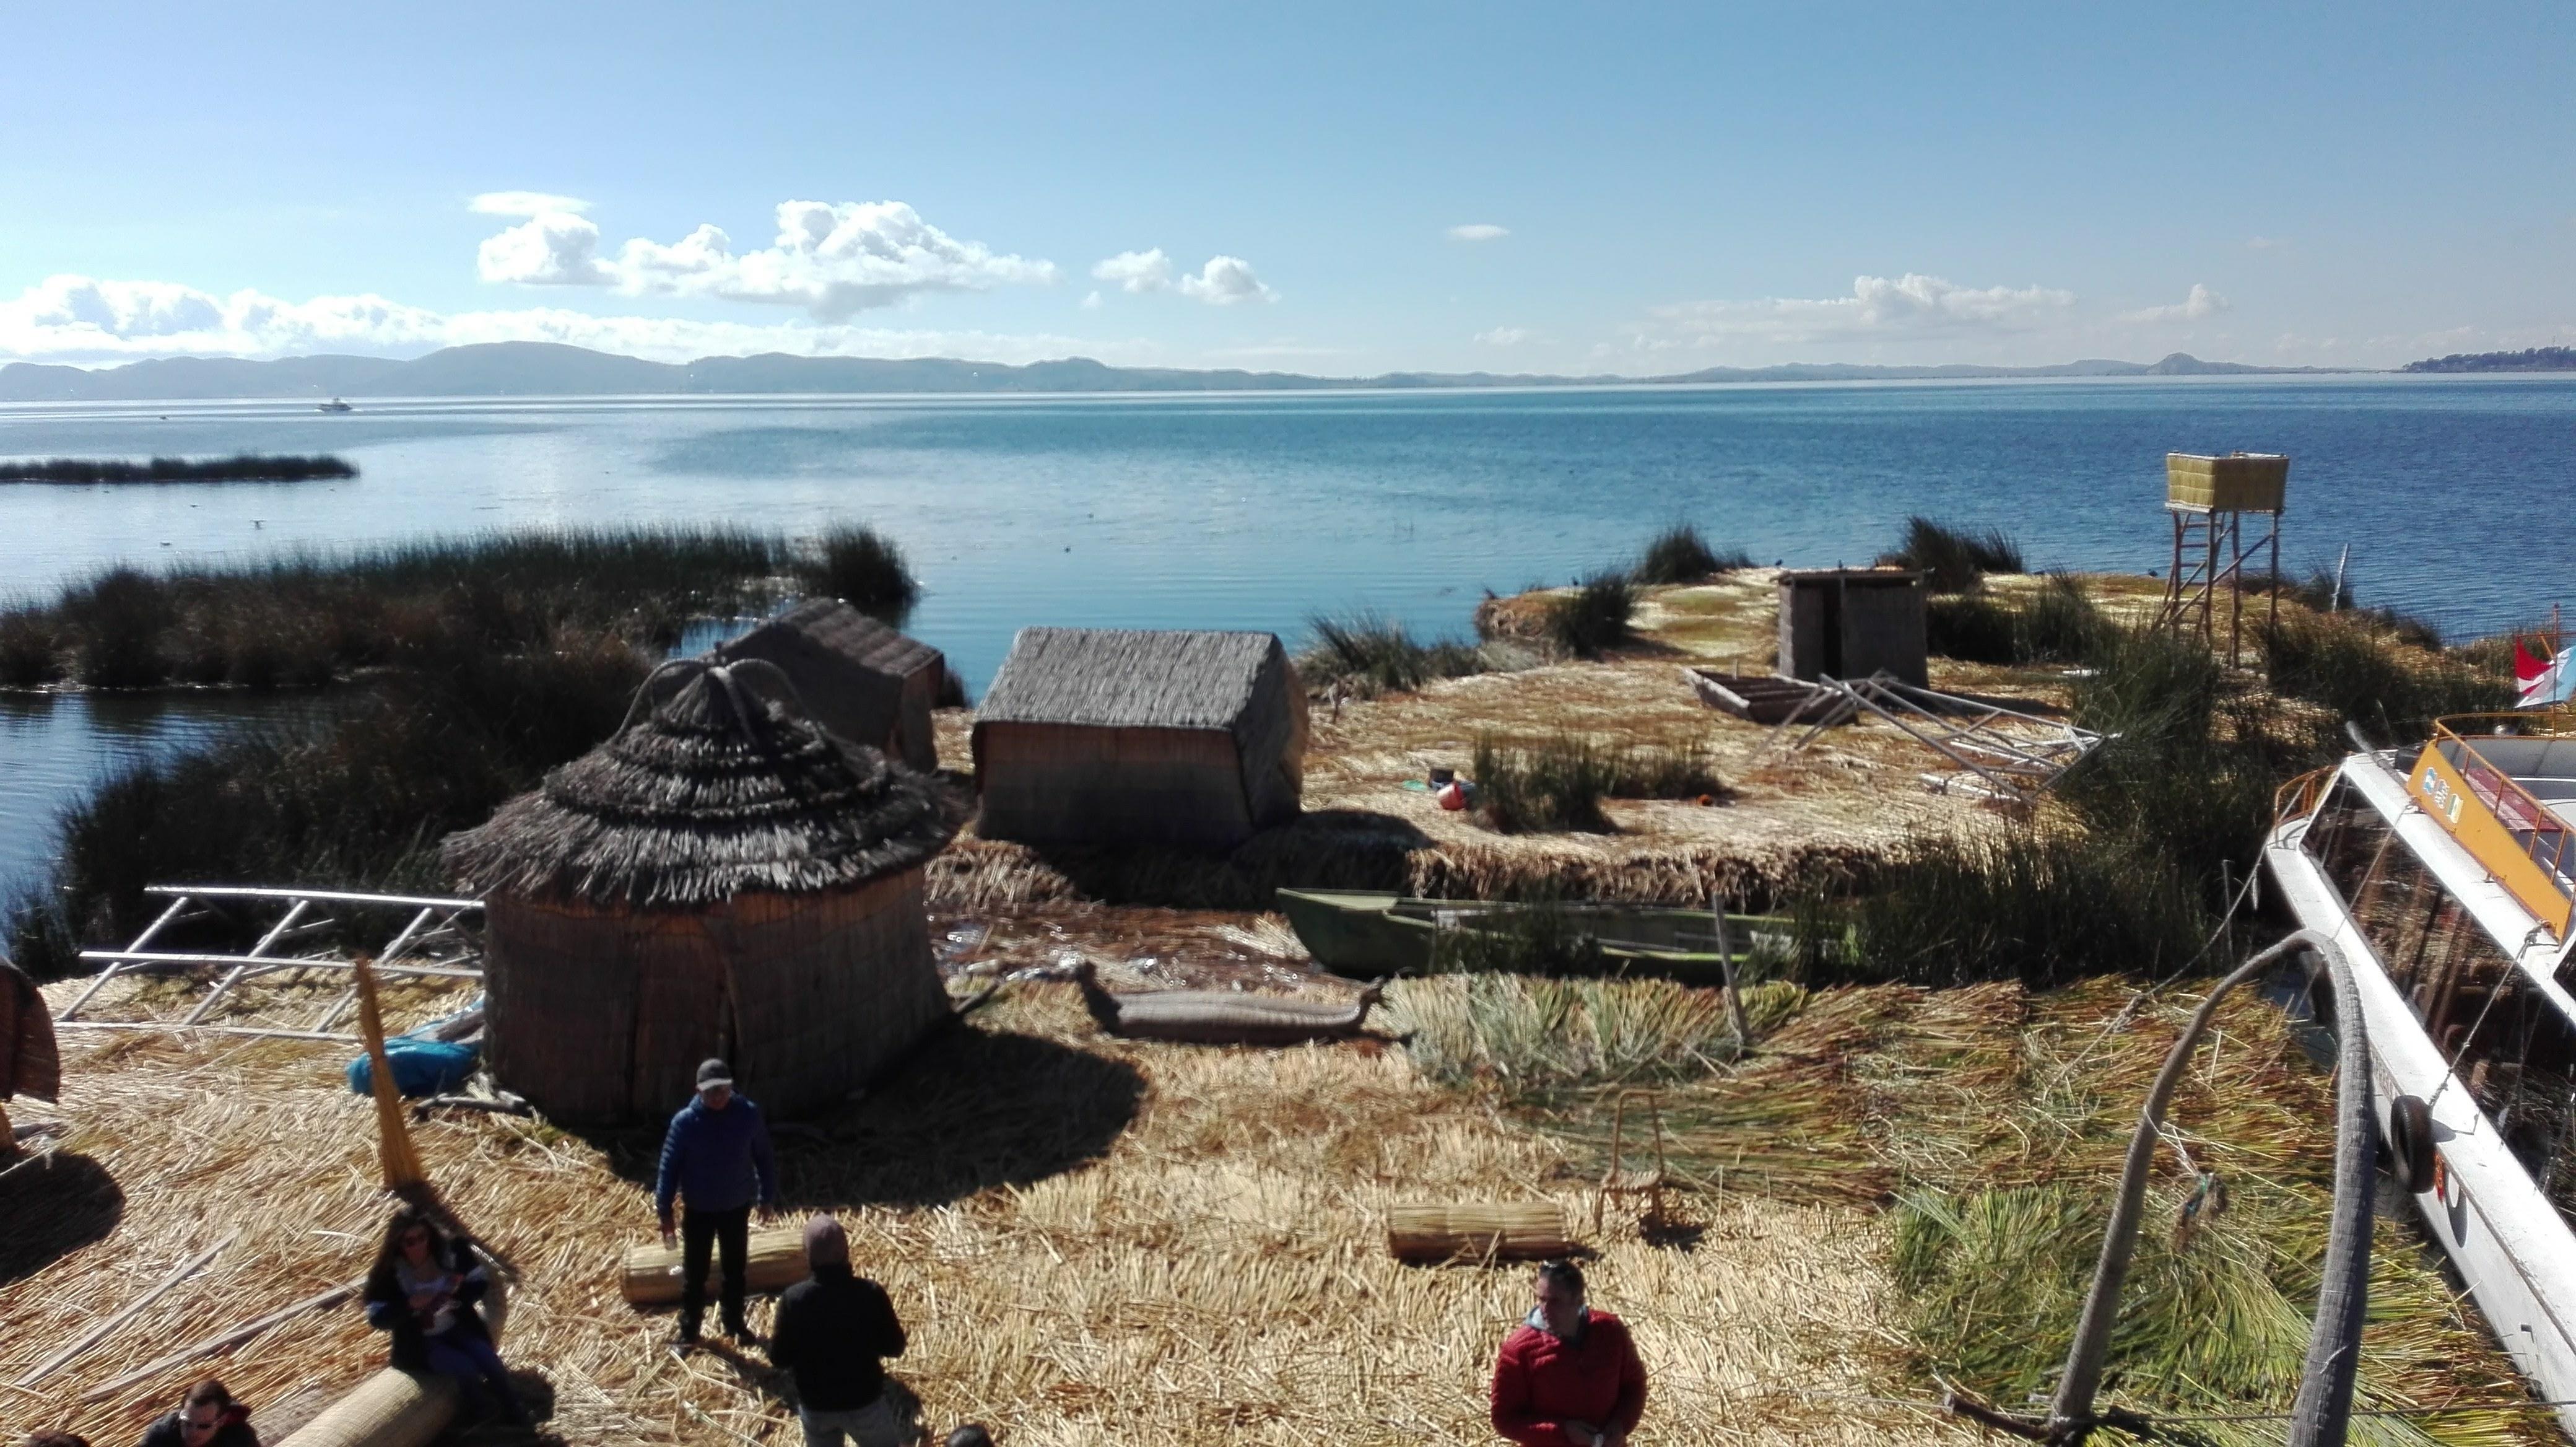 on Uros island